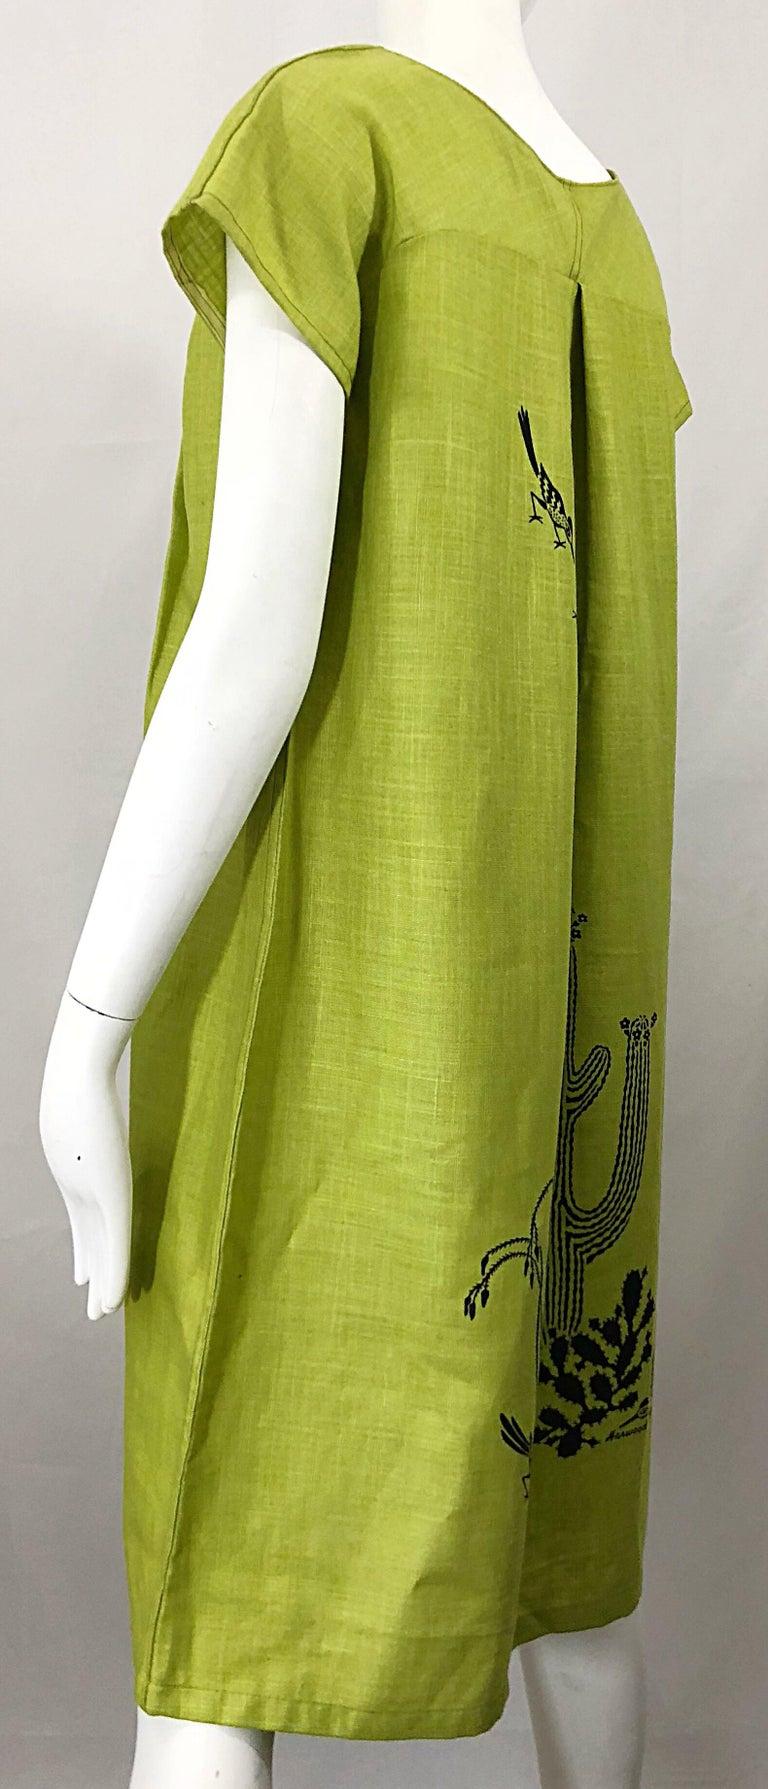 Rare 1970s Harwood Steiger Screen Printed Ant Eater Novelty Linen Tunic Dress For Sale 5